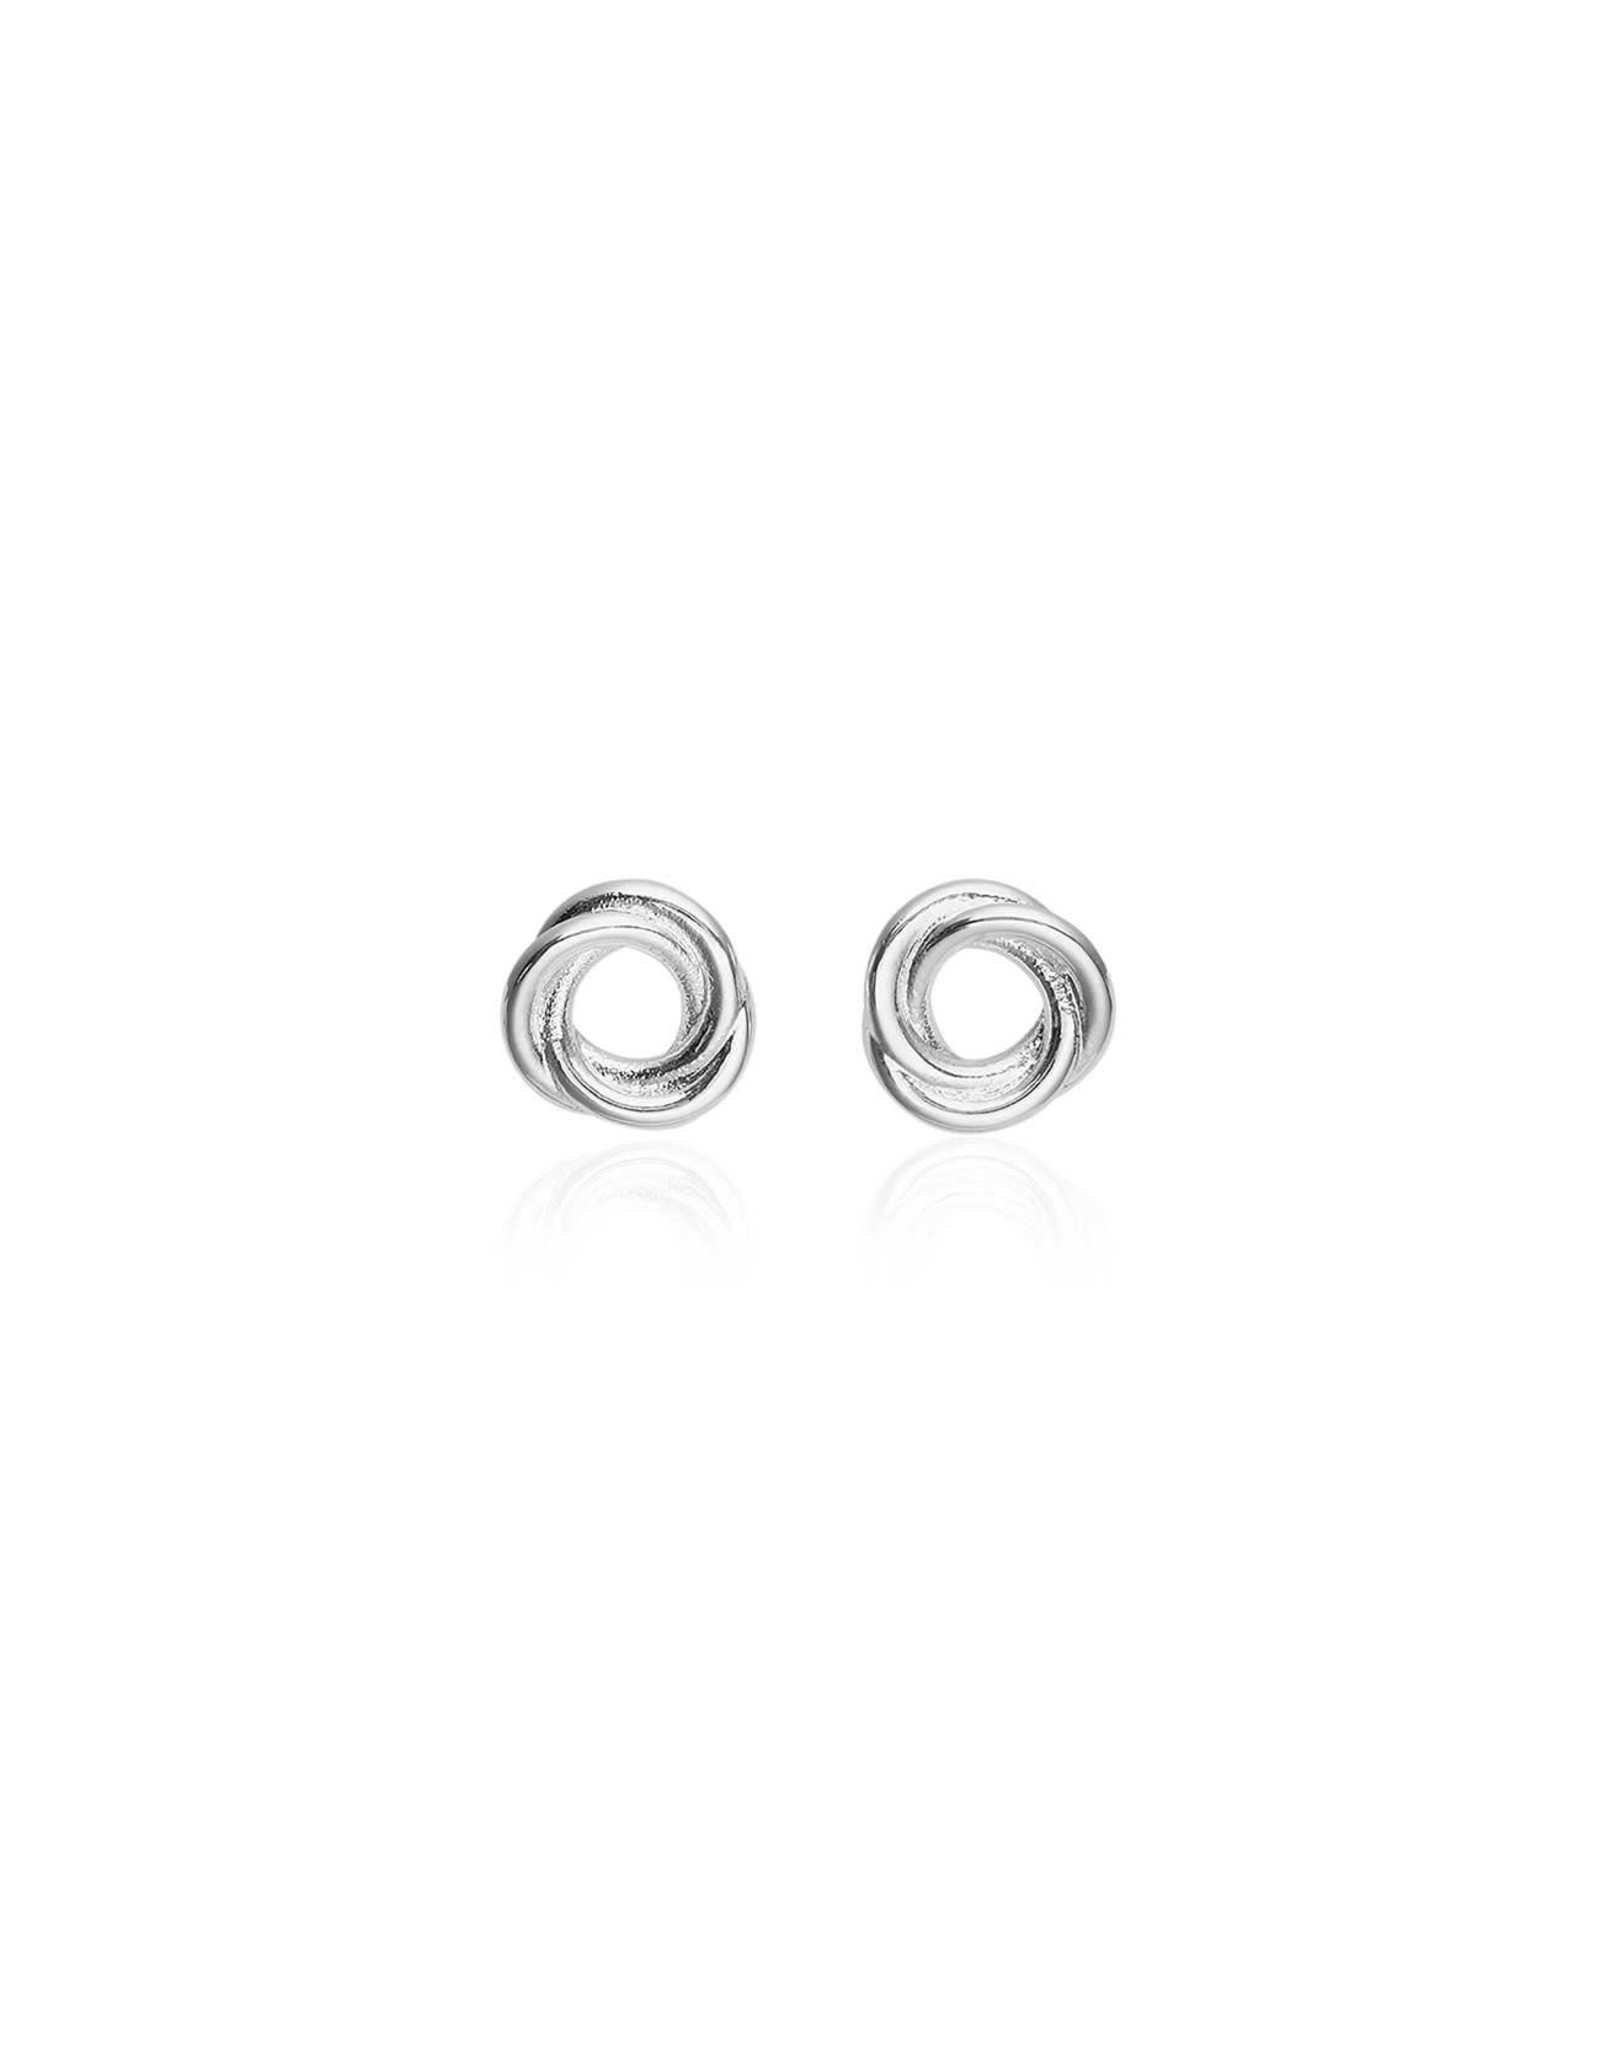 Joma Jewellery Treasure the Little Things - Friendship Knot